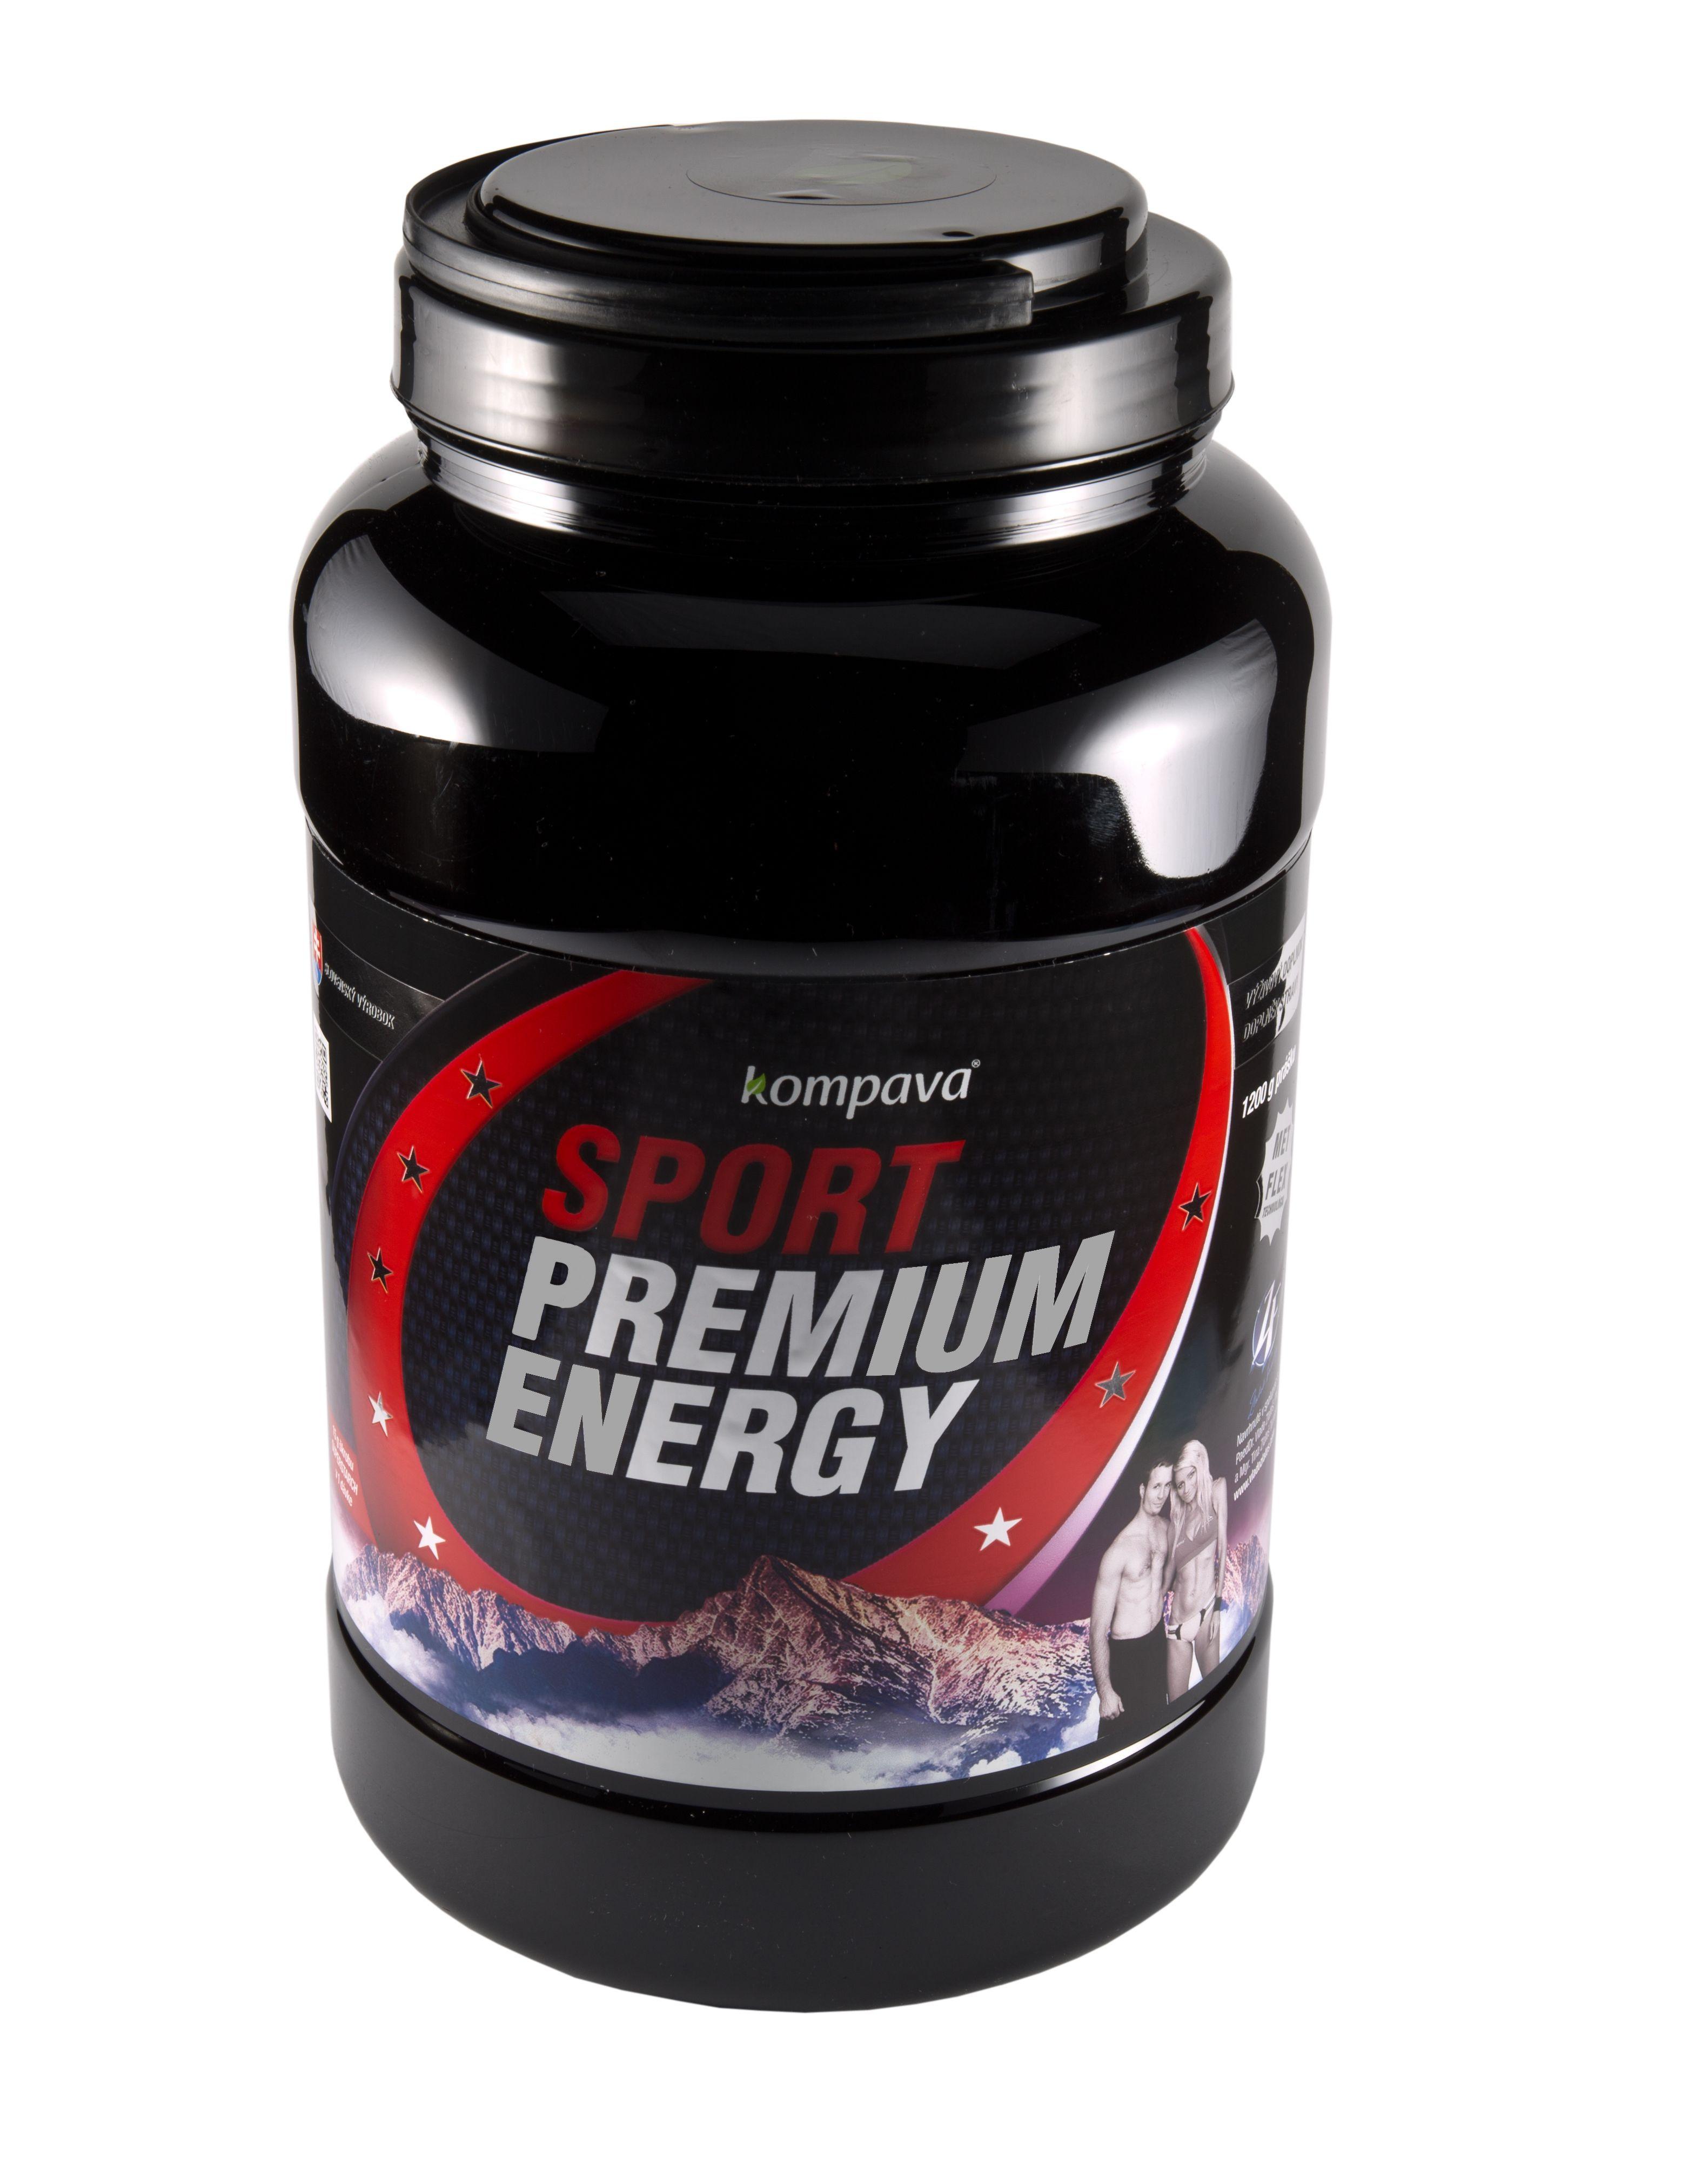 Kompava Sport Premium Energy 1200g